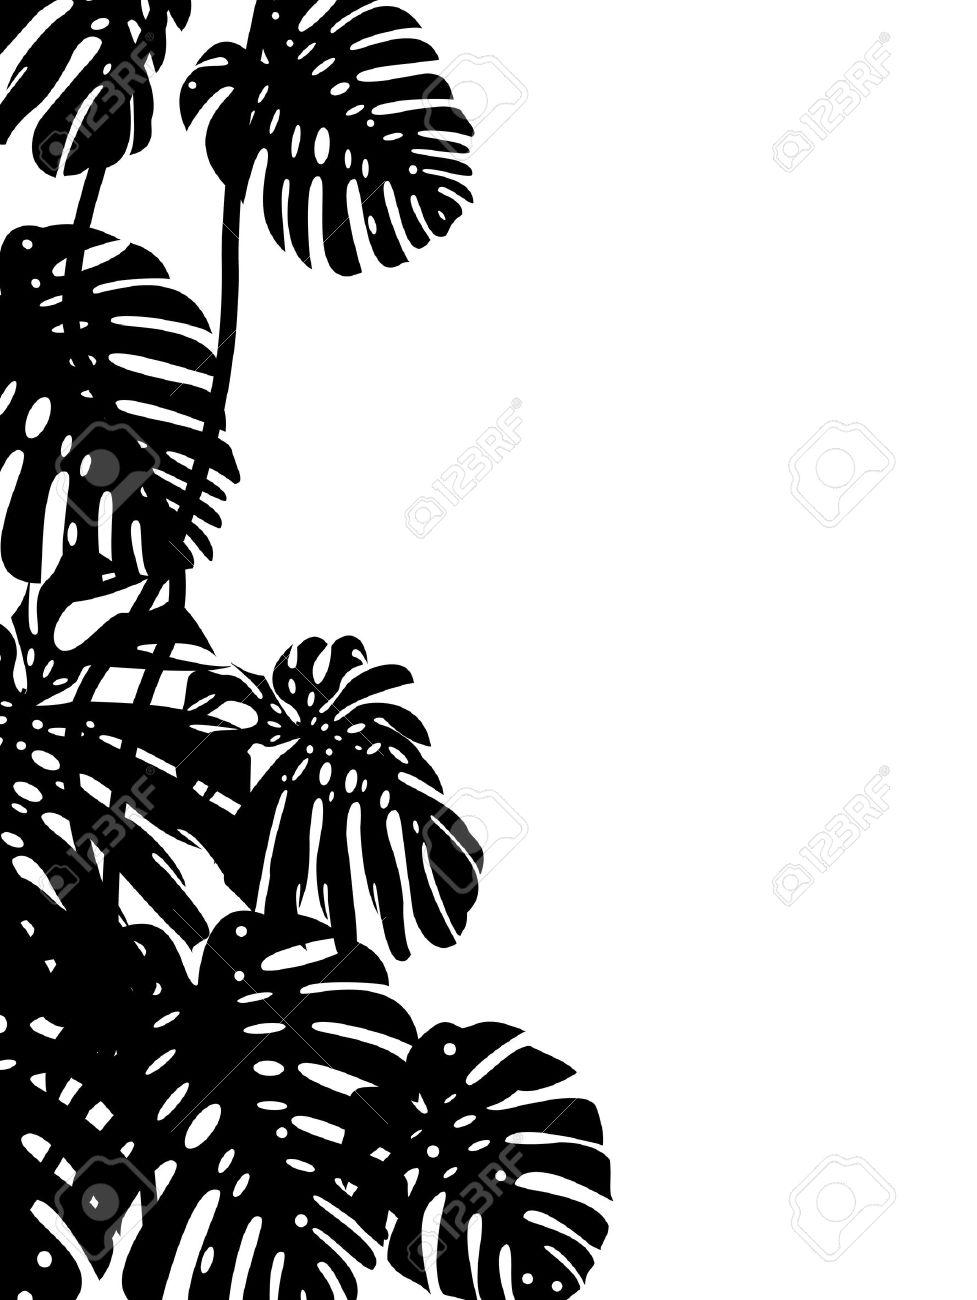 977x1300 Tropics Clipart Black And White 4013608